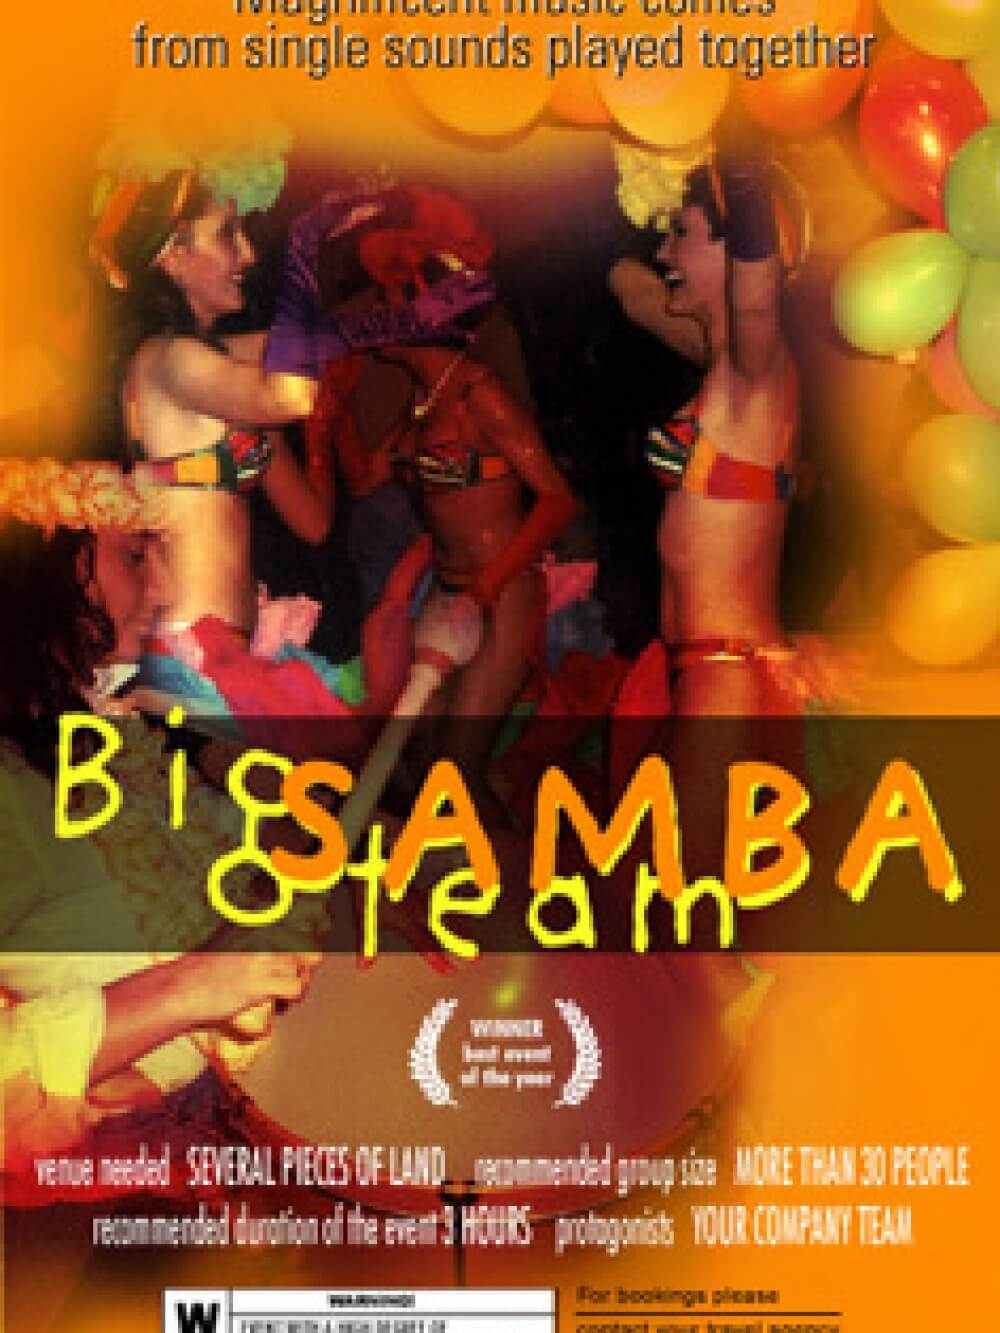 big_samba_team_vertical_web